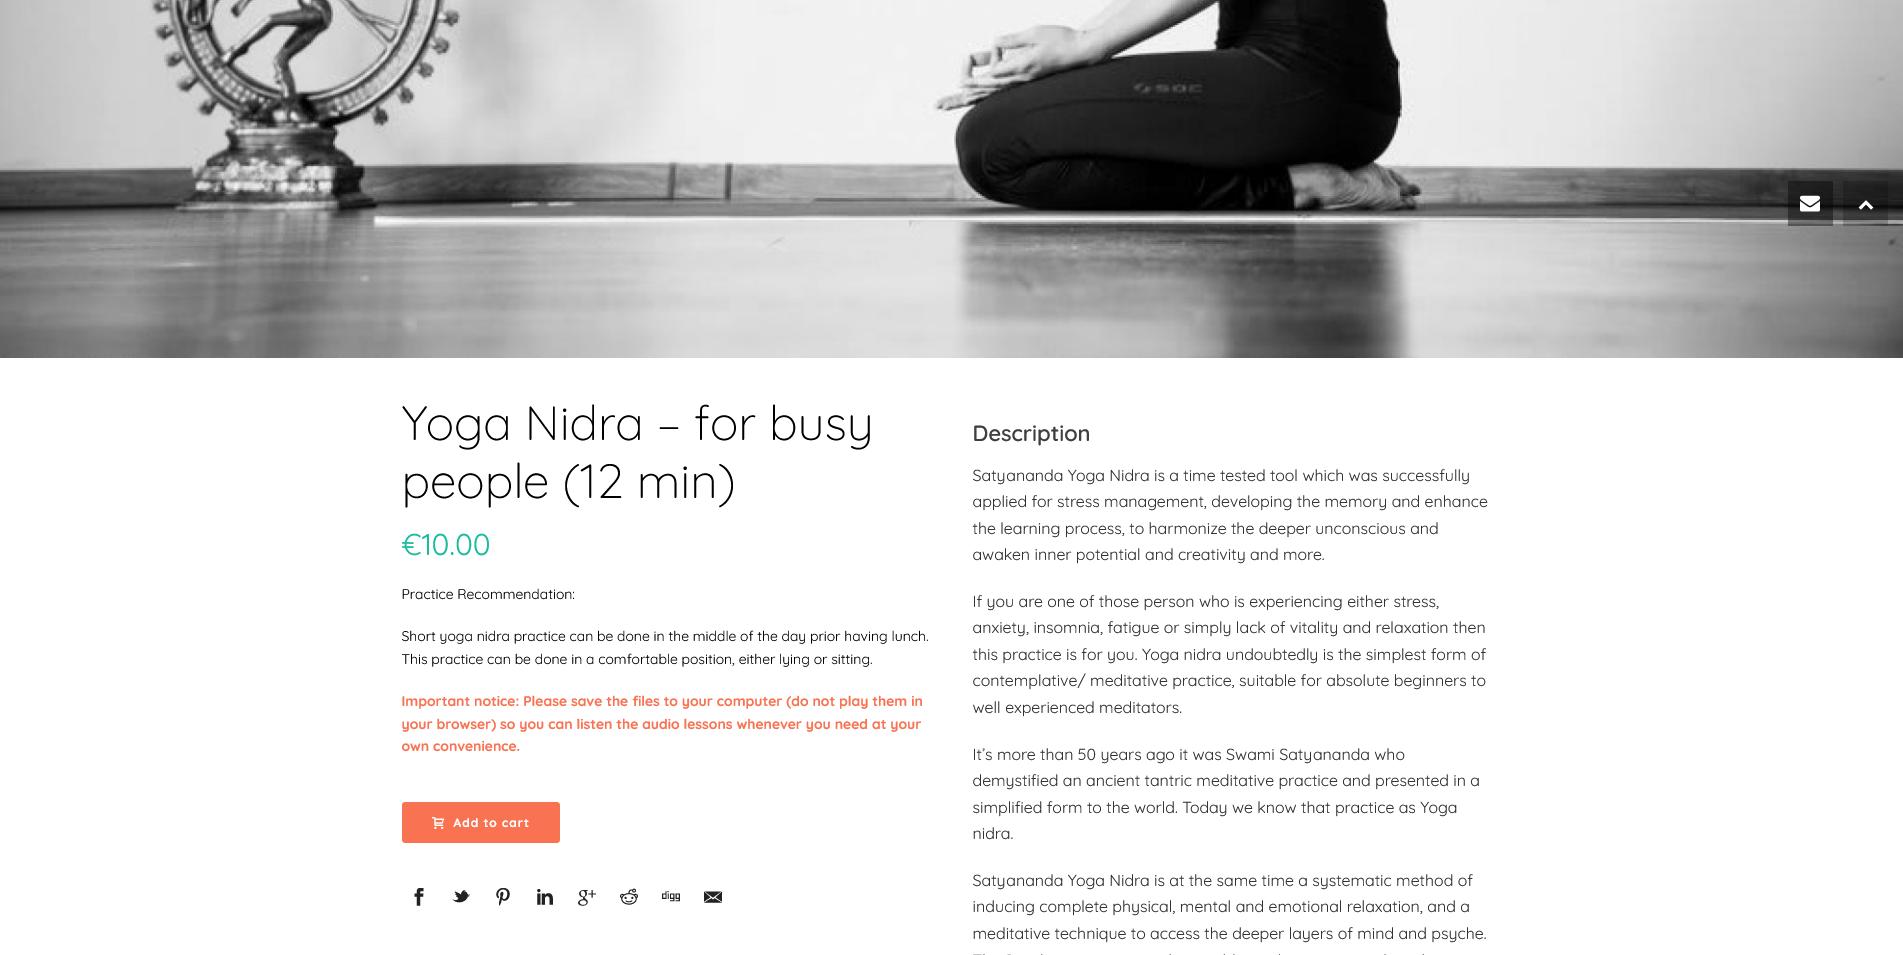 Yoga Nidra - for busy people (12 min) Satyananda Yoga